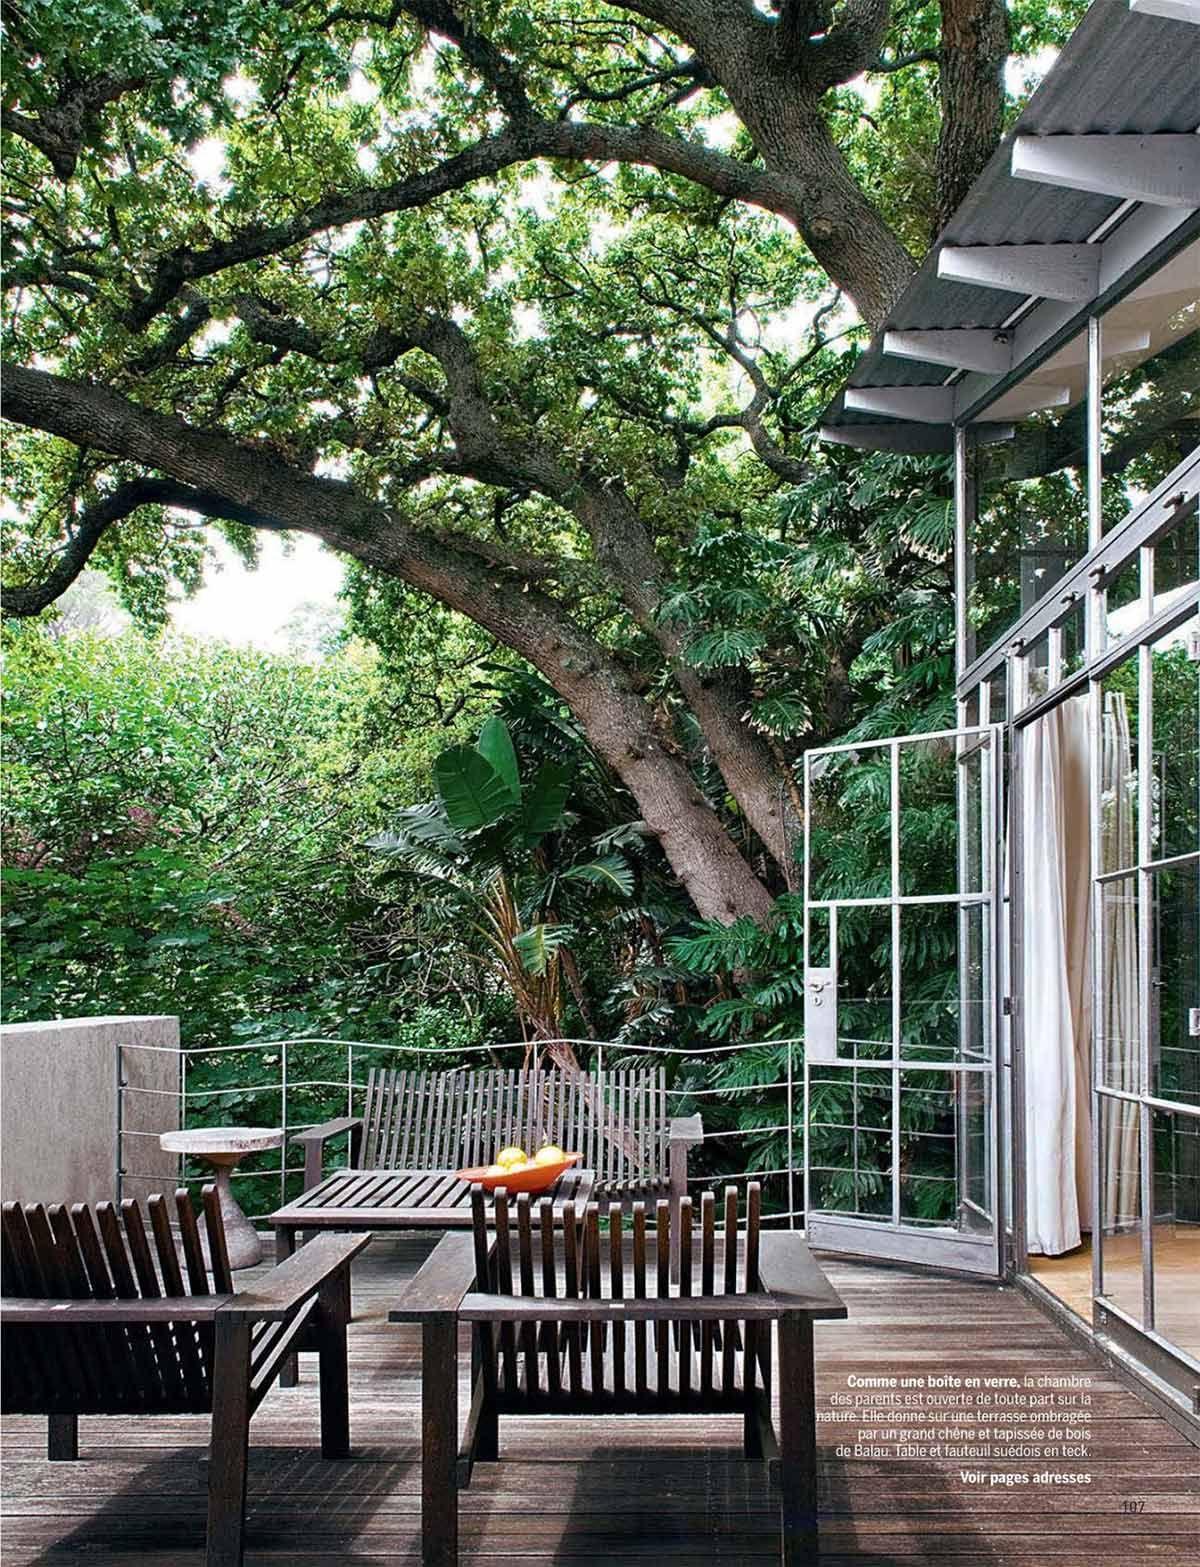 Une Maison Perchee Au Milieu Des Arbres Aux Cap Leben Unter Freiem Himmel Terassenideen Hintergarten